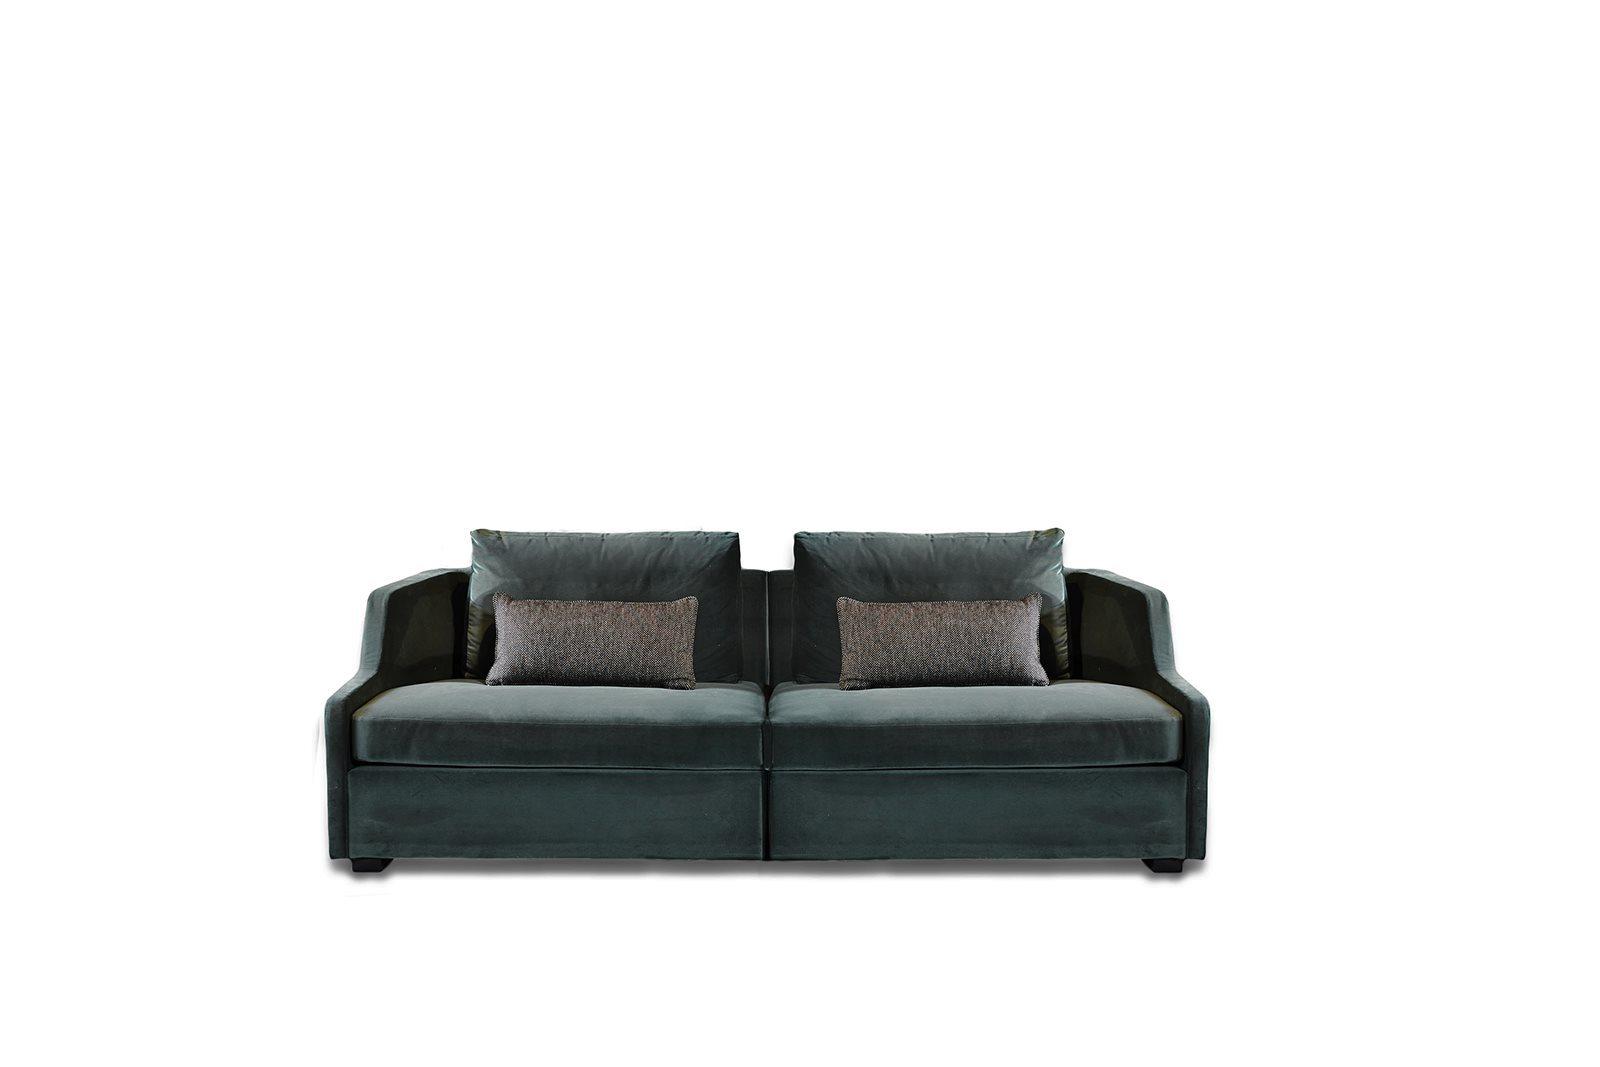 Gallotti & Radice First Modulare sofa 2.jpg